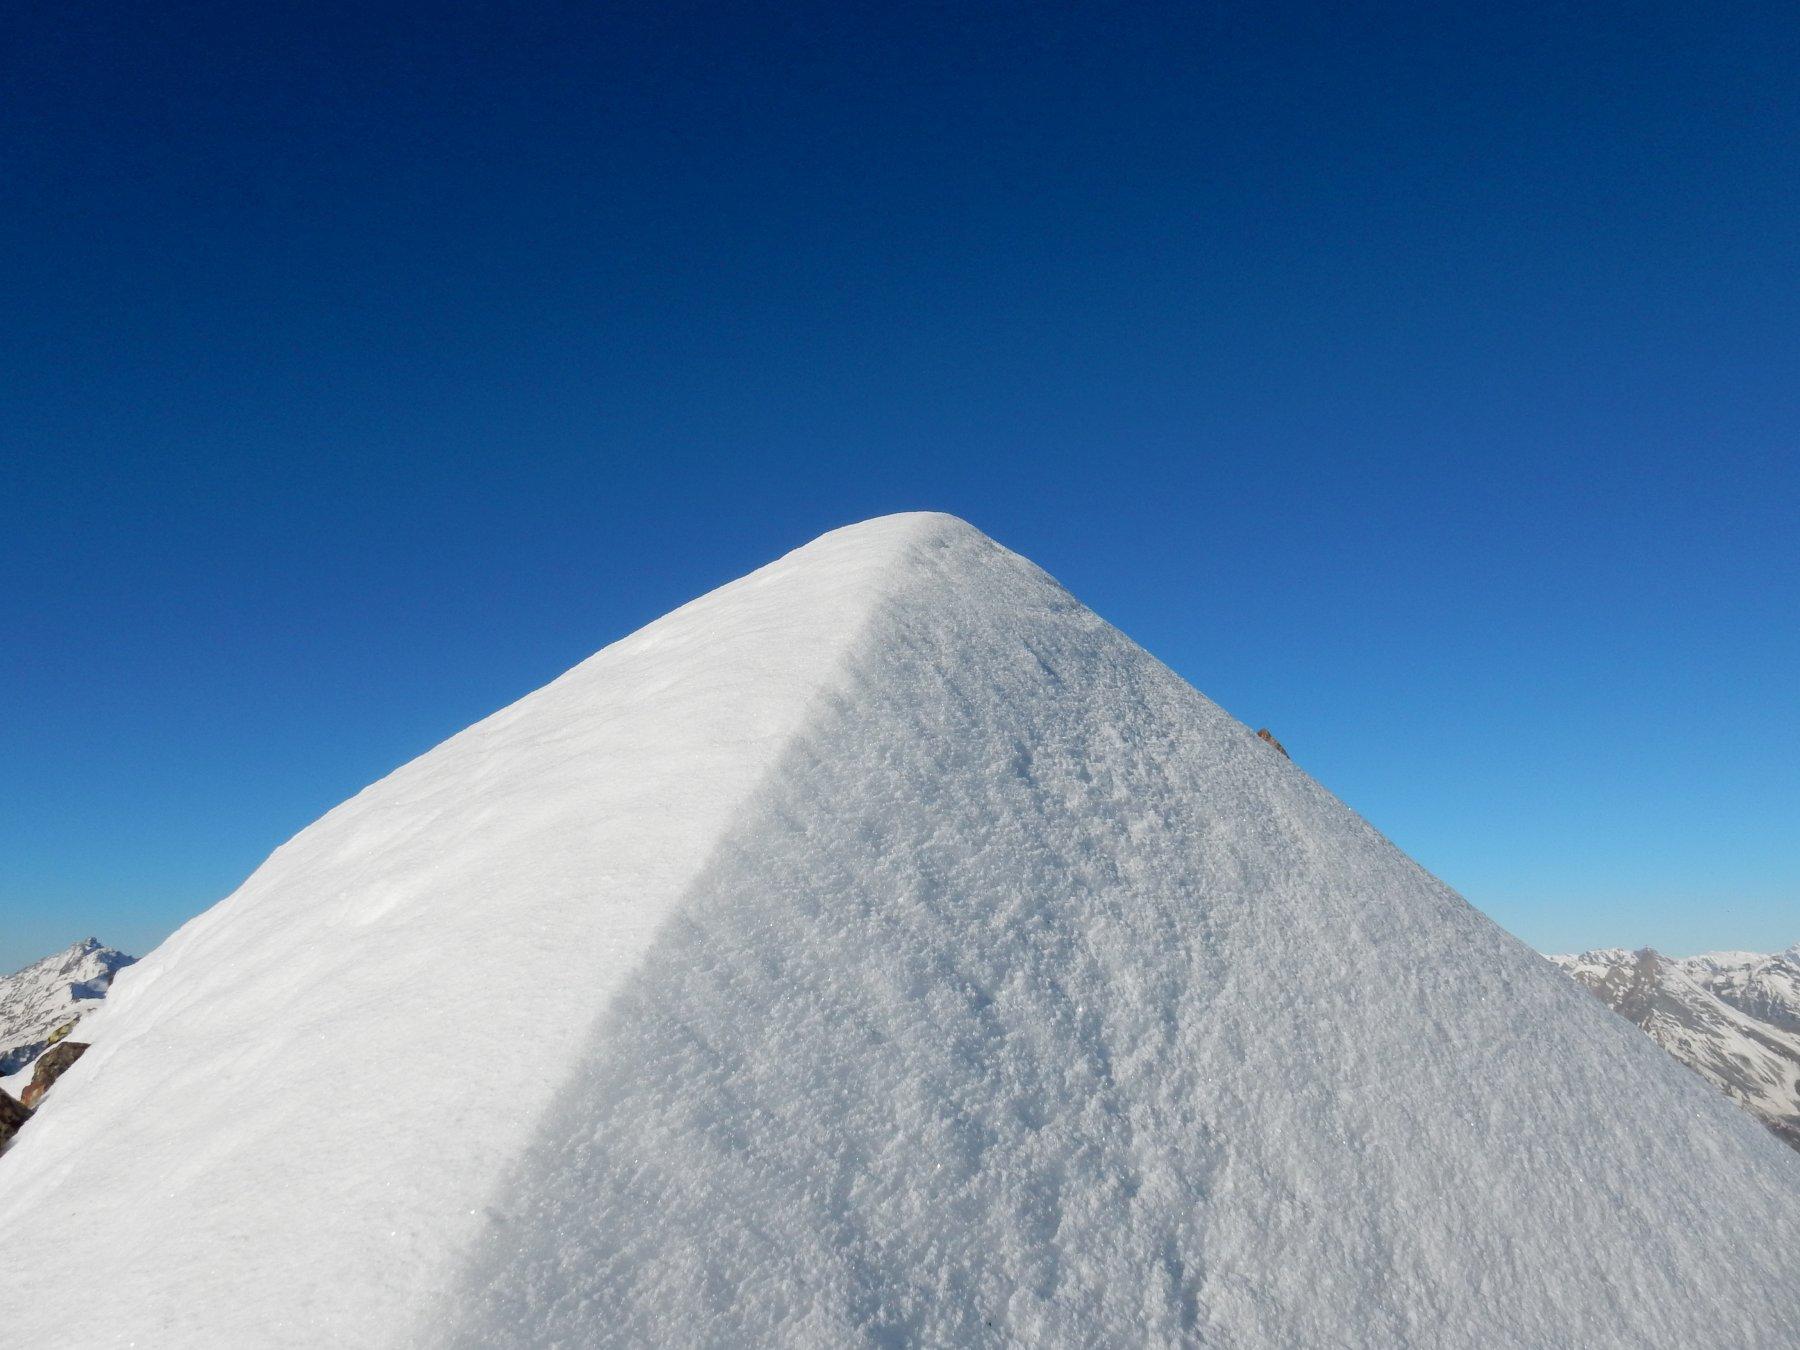 Arrivo sulla punta nevosa di P.ta Garin.